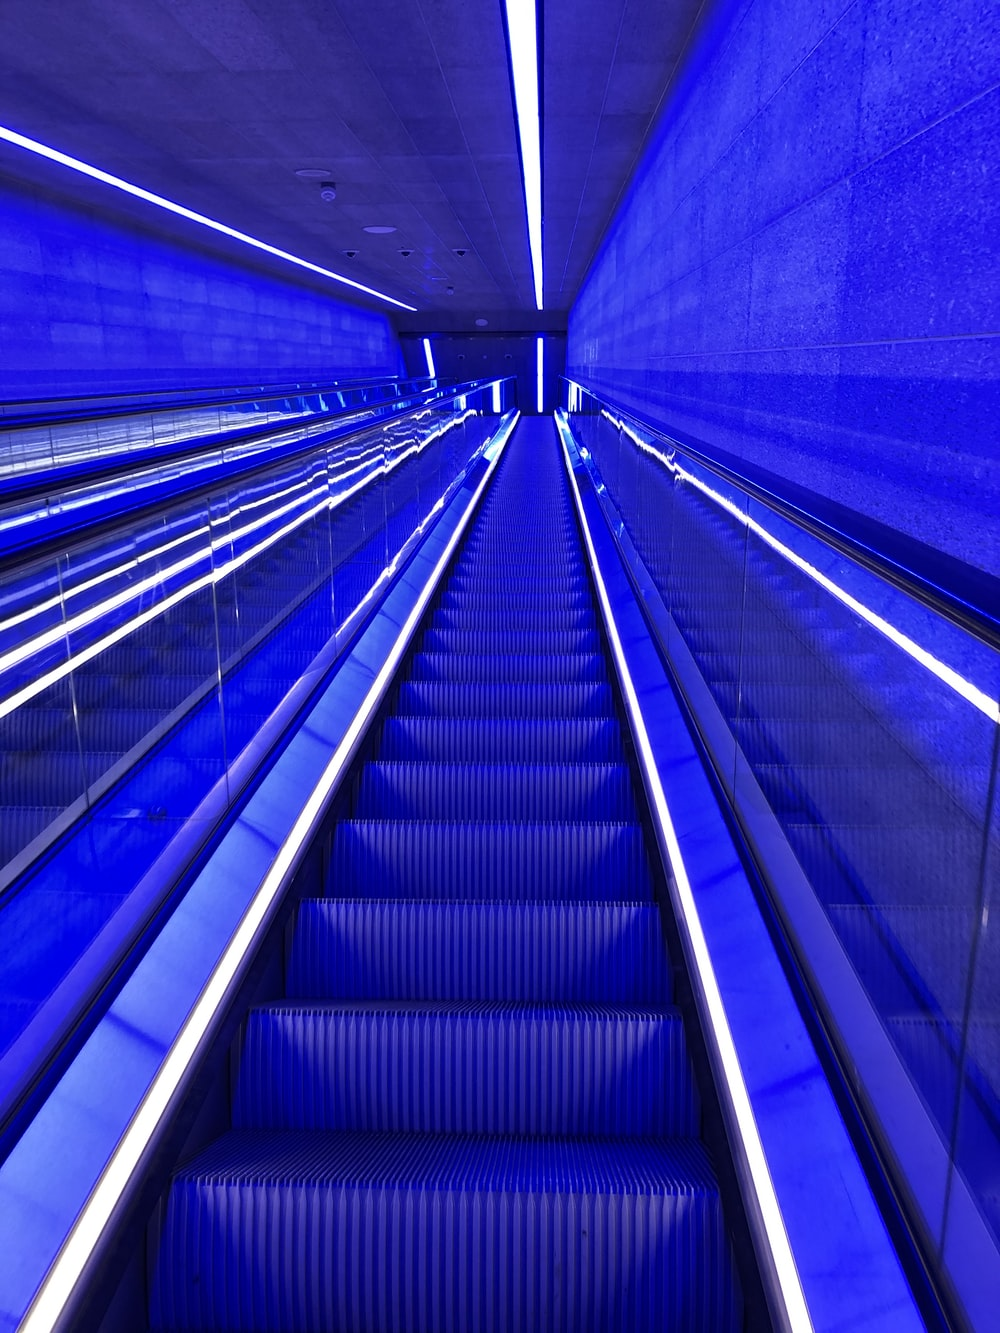 blue and white escalator in tunnel